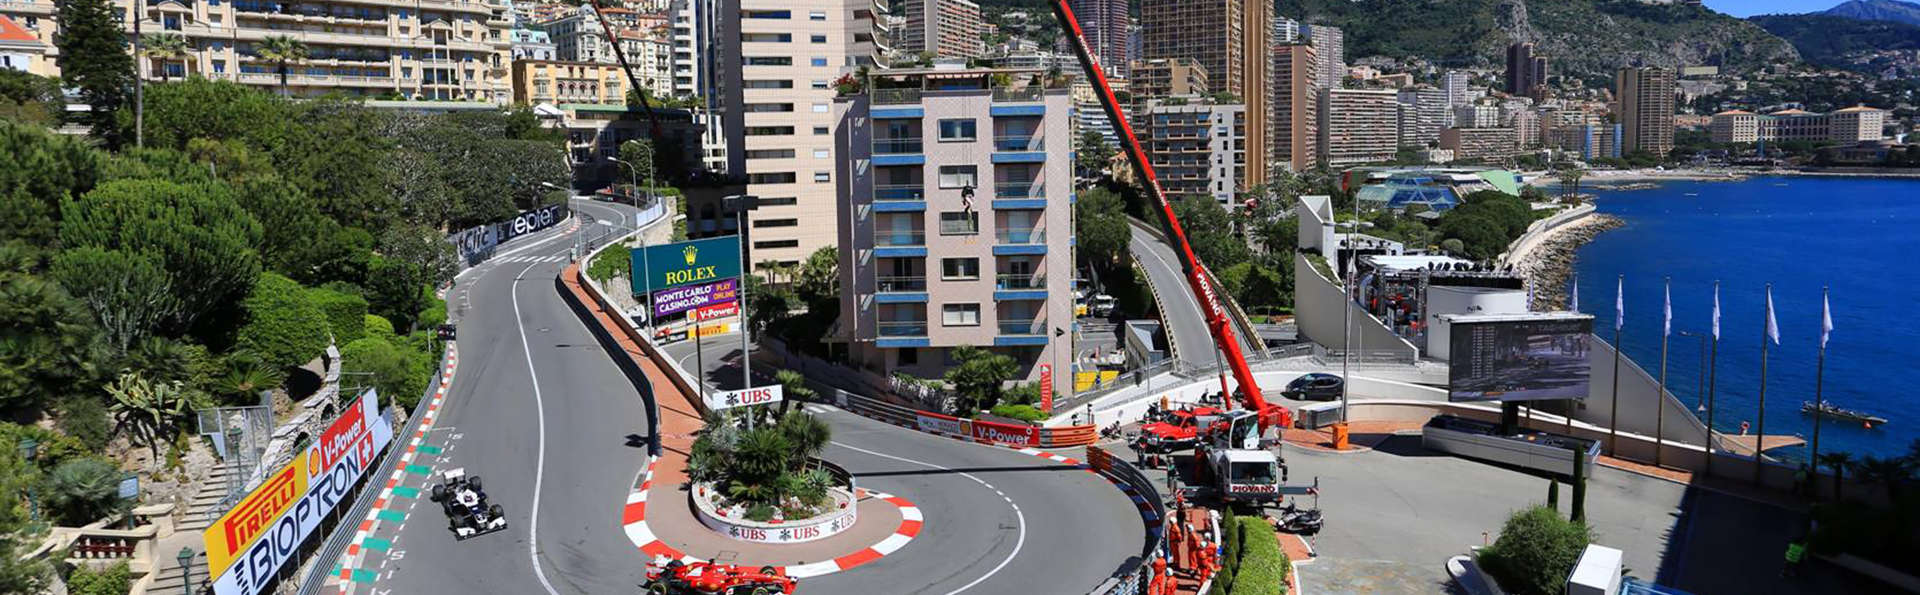 Fairmont Monte Carlo - EDIT_NEW_GP.jpg